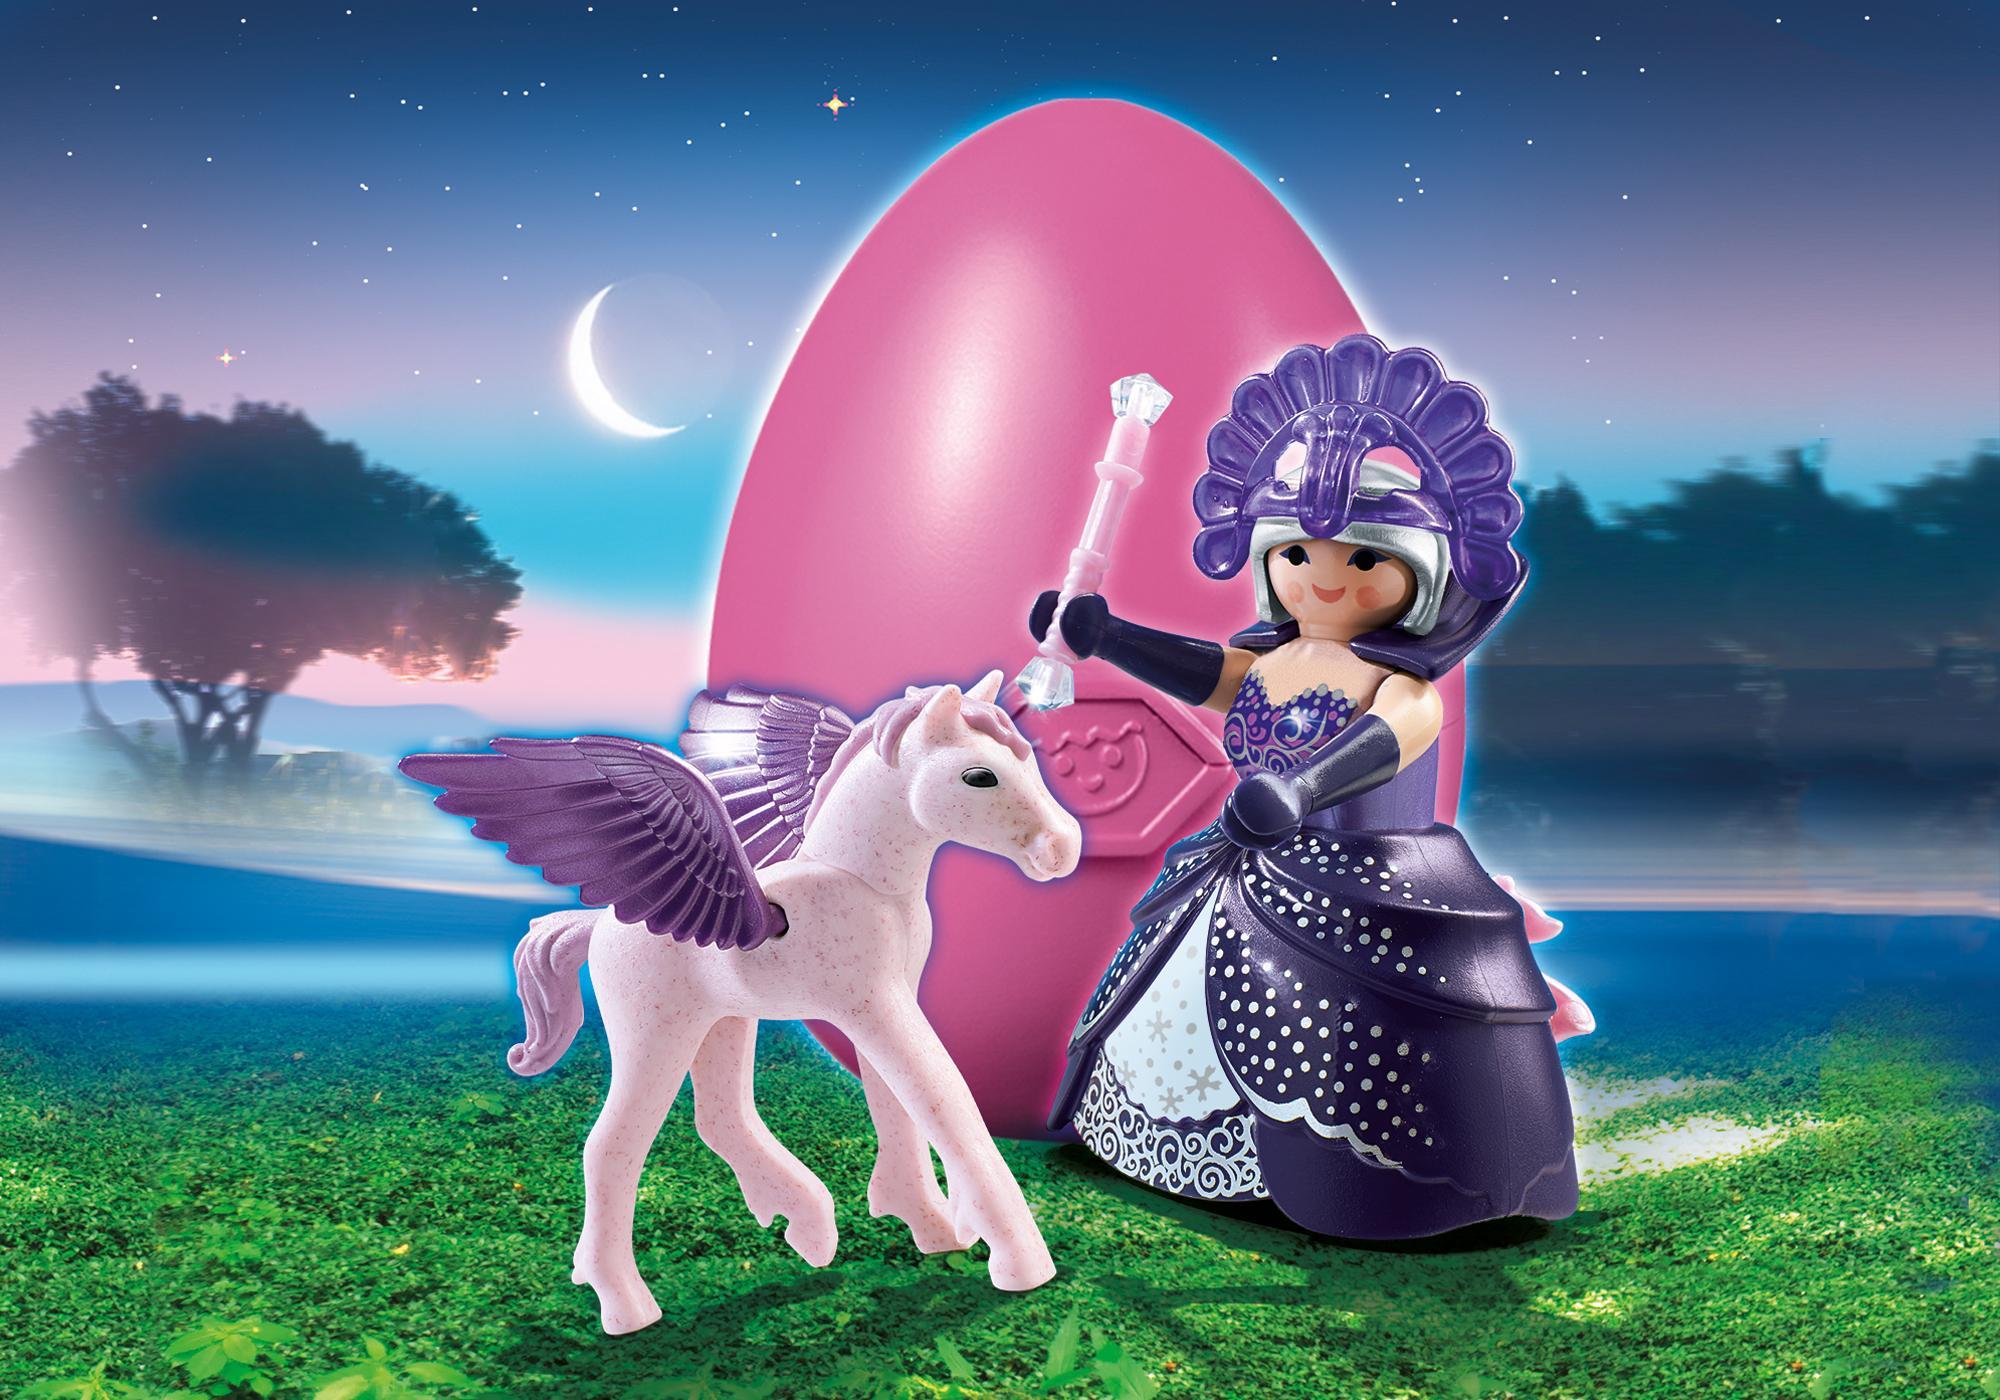 http://media.playmobil.com/i/playmobil/6837_product_detail/Mondscheinkönigin mit Baby-Pegasus